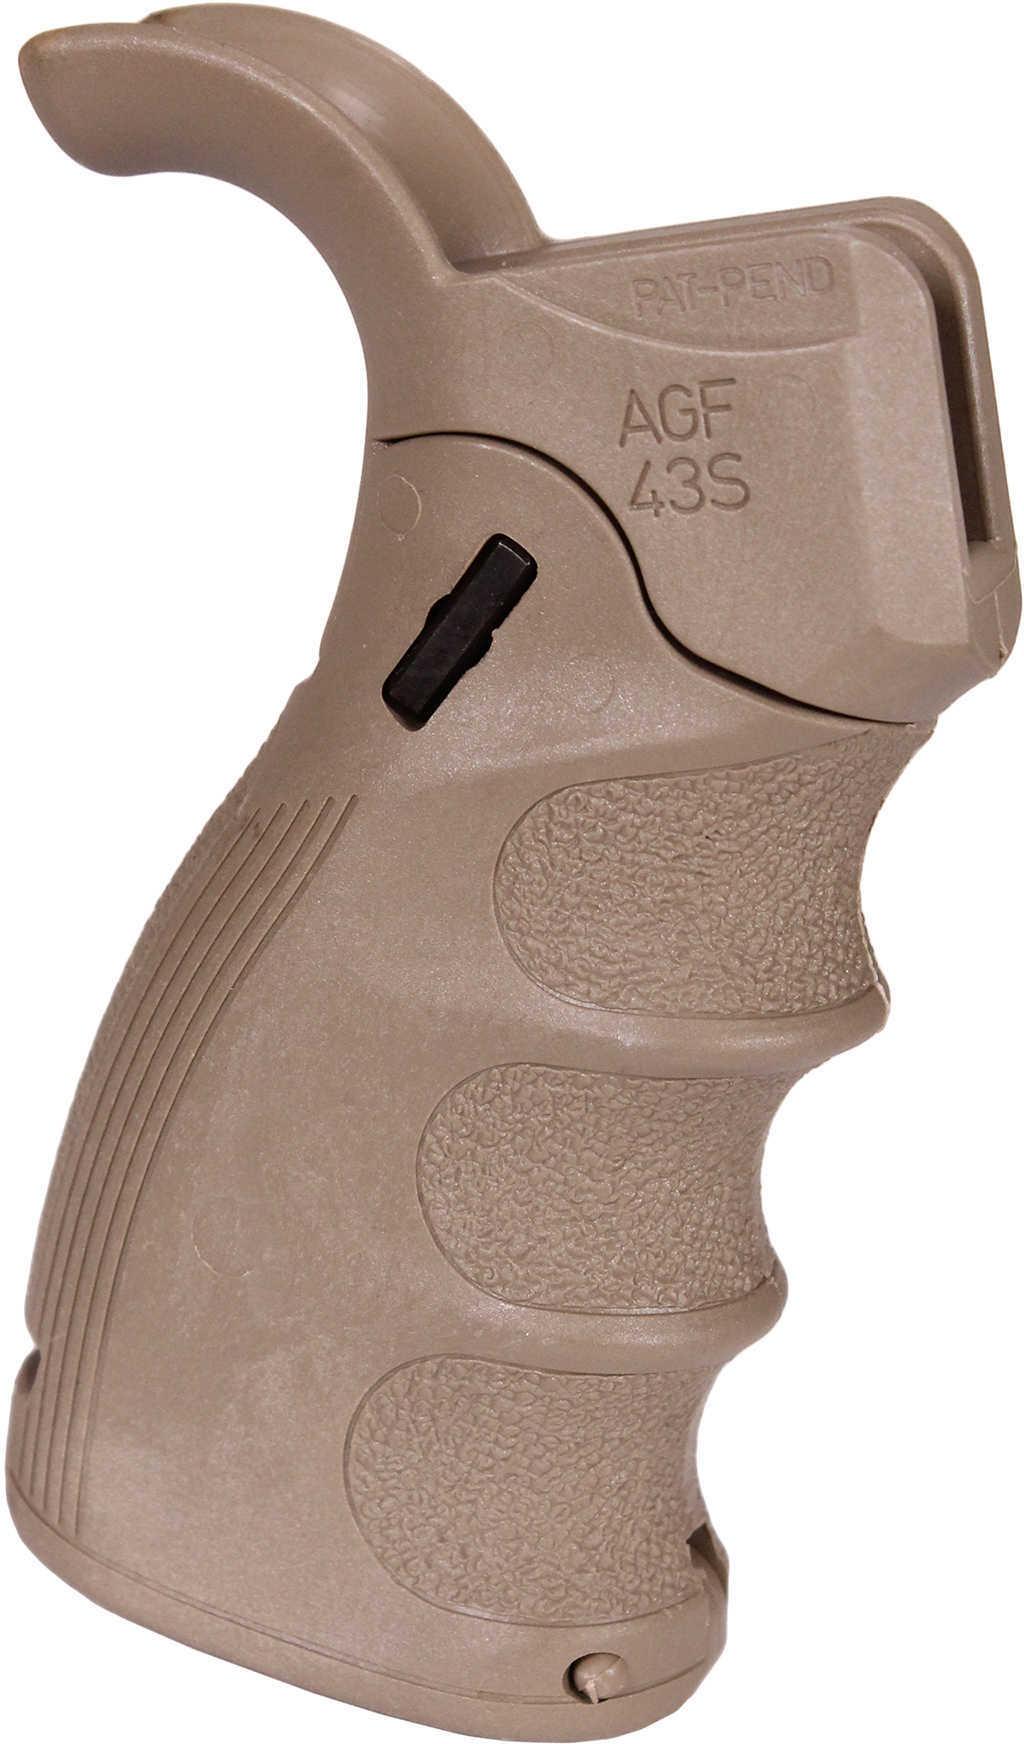 Mako Group Ergonomic Folding Pistol Grip M16/M4/AR-15, Flat Dark Earth Md: AGF-43S-FDE